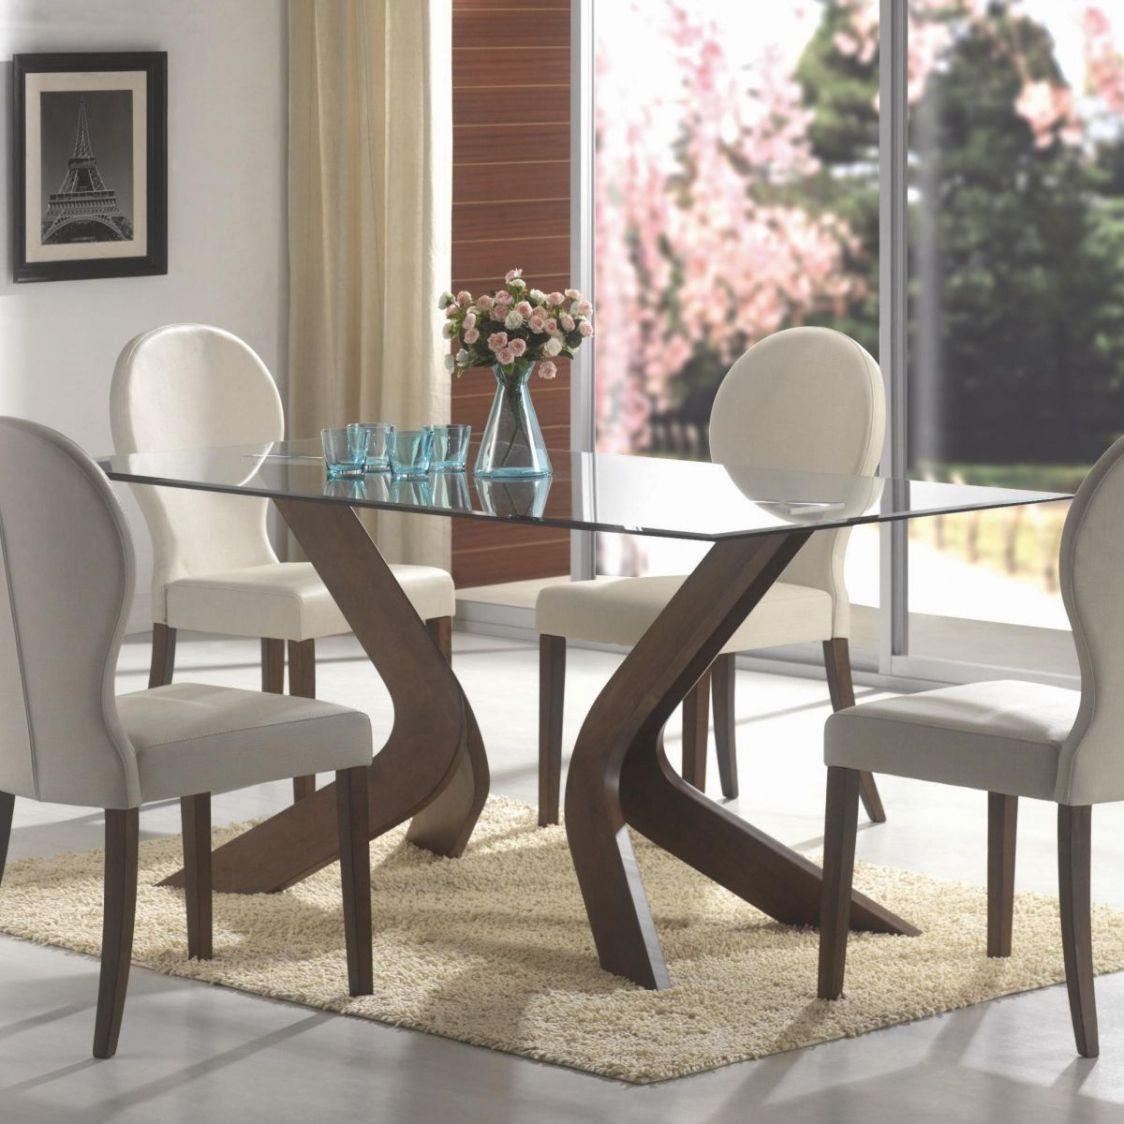 Glass Dining Room Tables For Sale  Best Home Office Furniture Impressive Glass Dining Room Table Sets Design Decoration